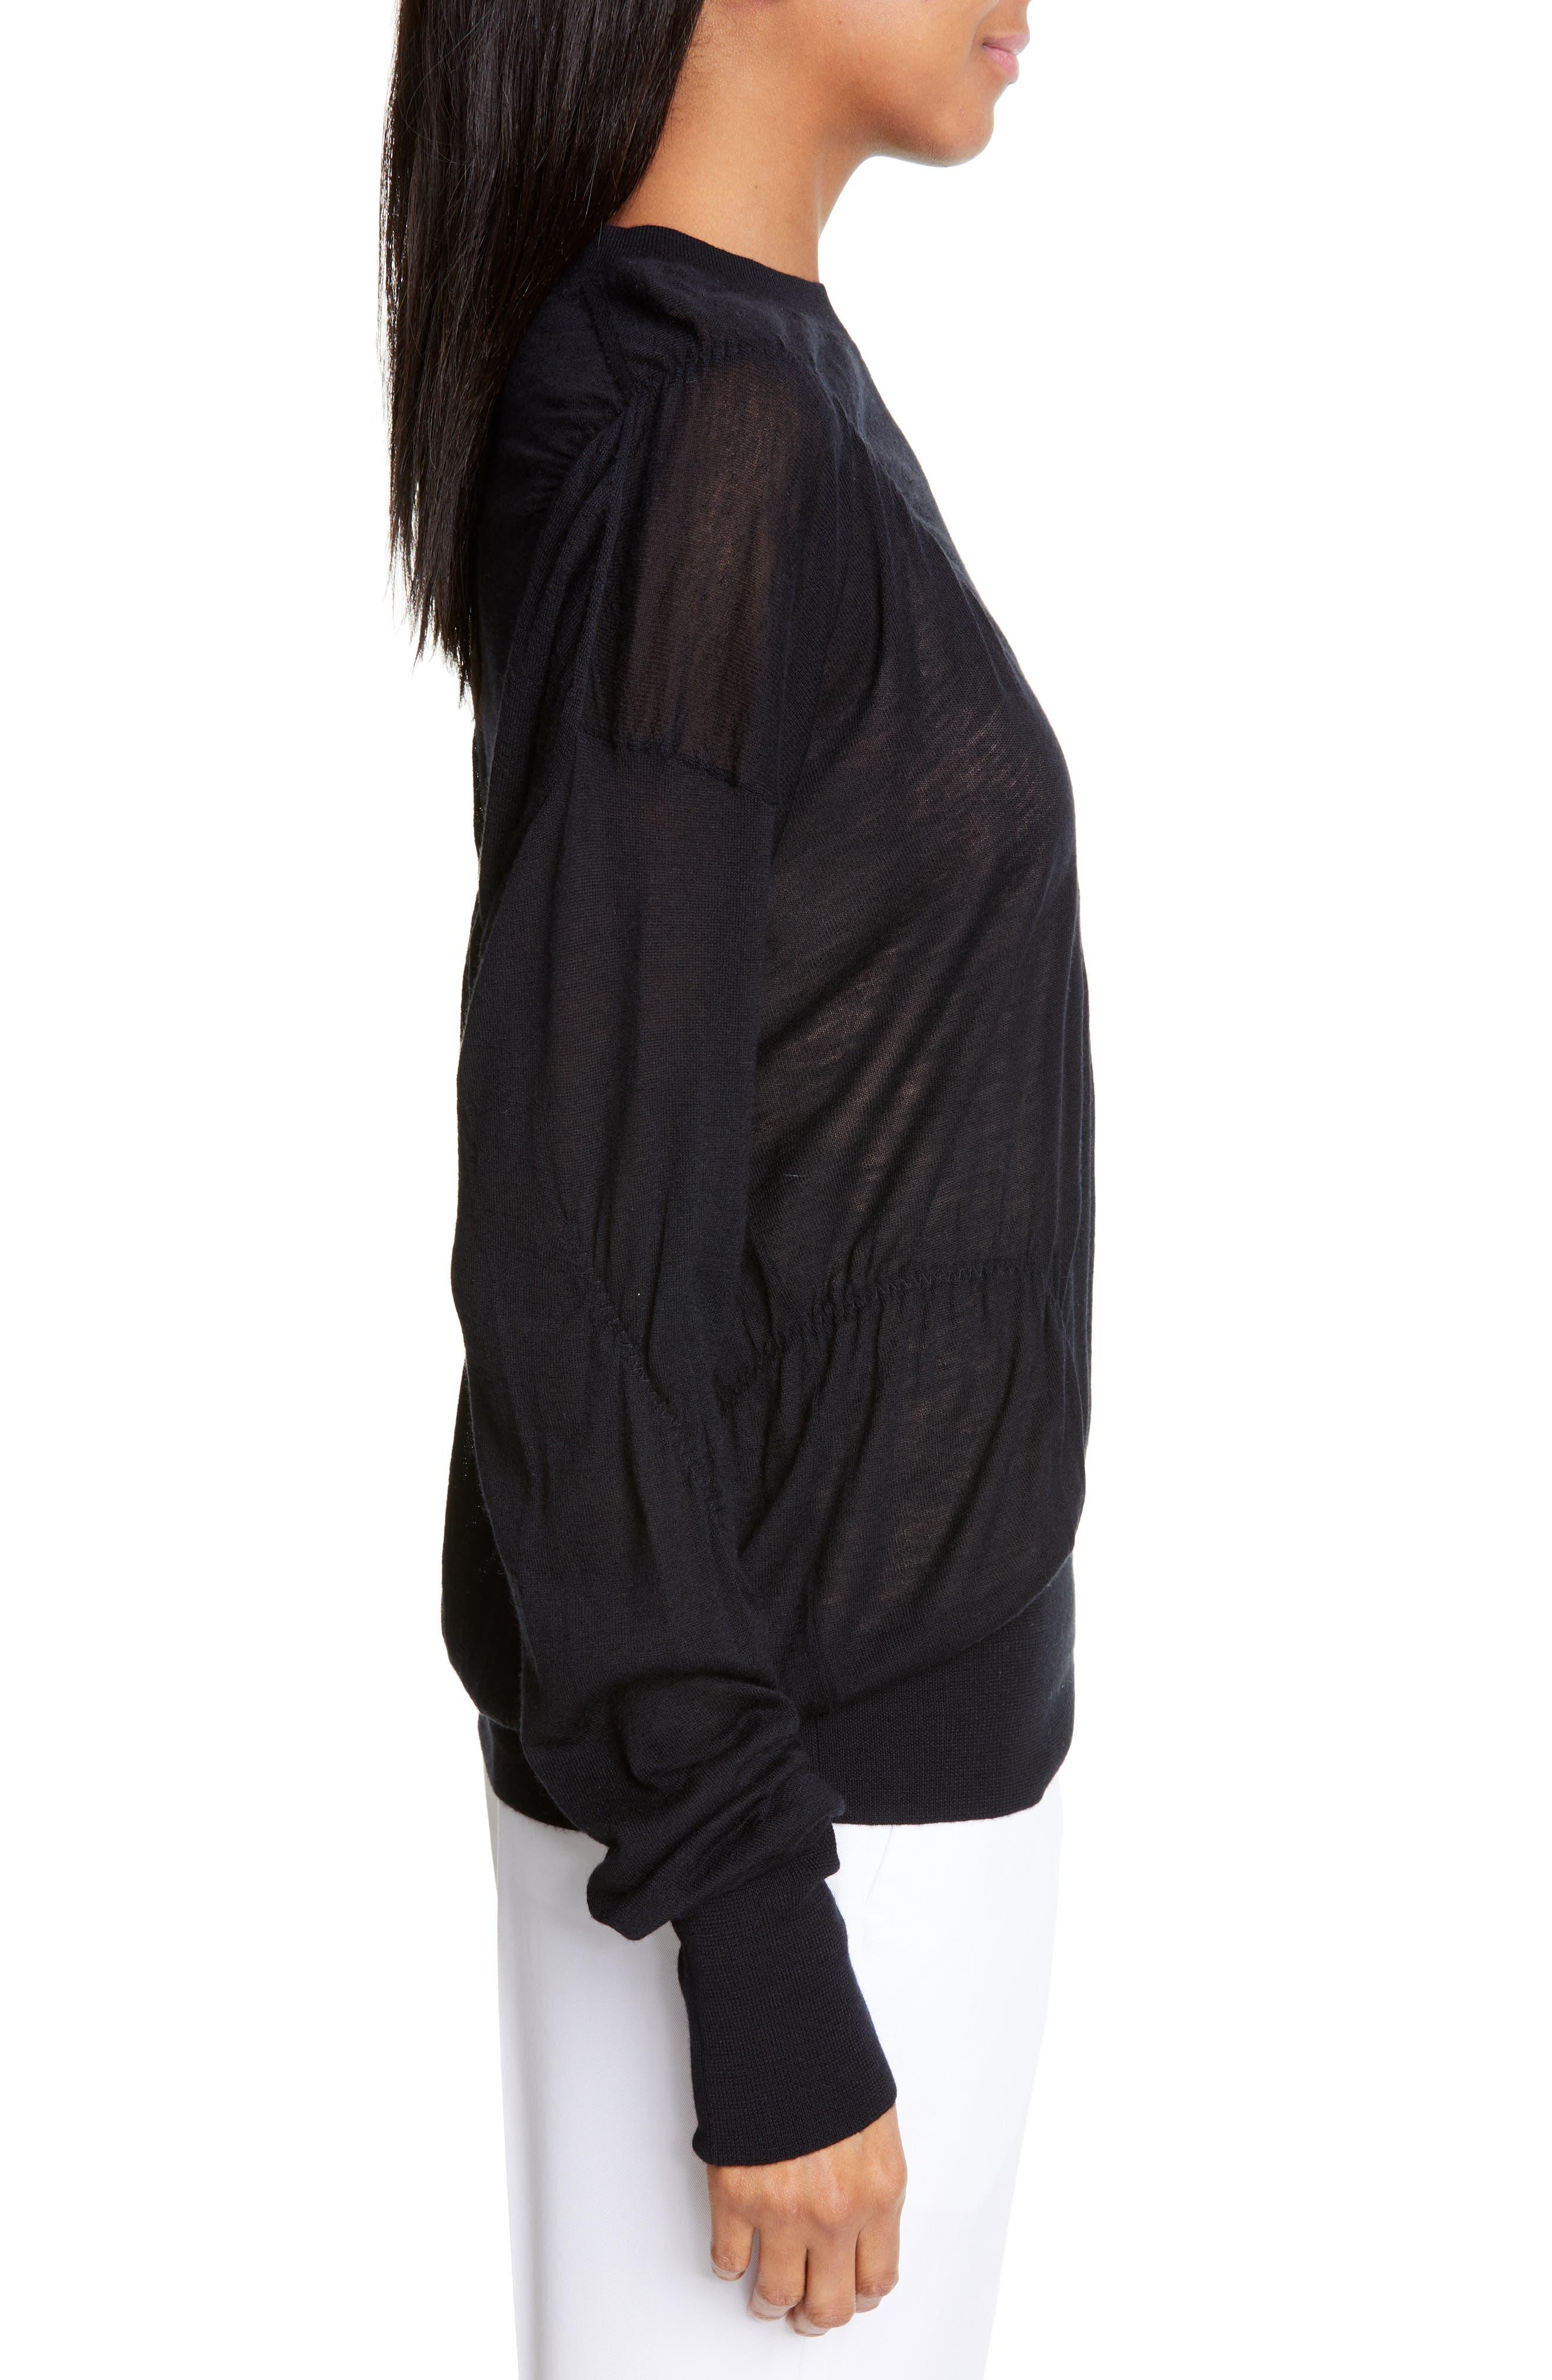 HELMUT LANG, Ruched Seam Detail Cashmere Sweater, Alternate thumbnail 3, color, BLACK